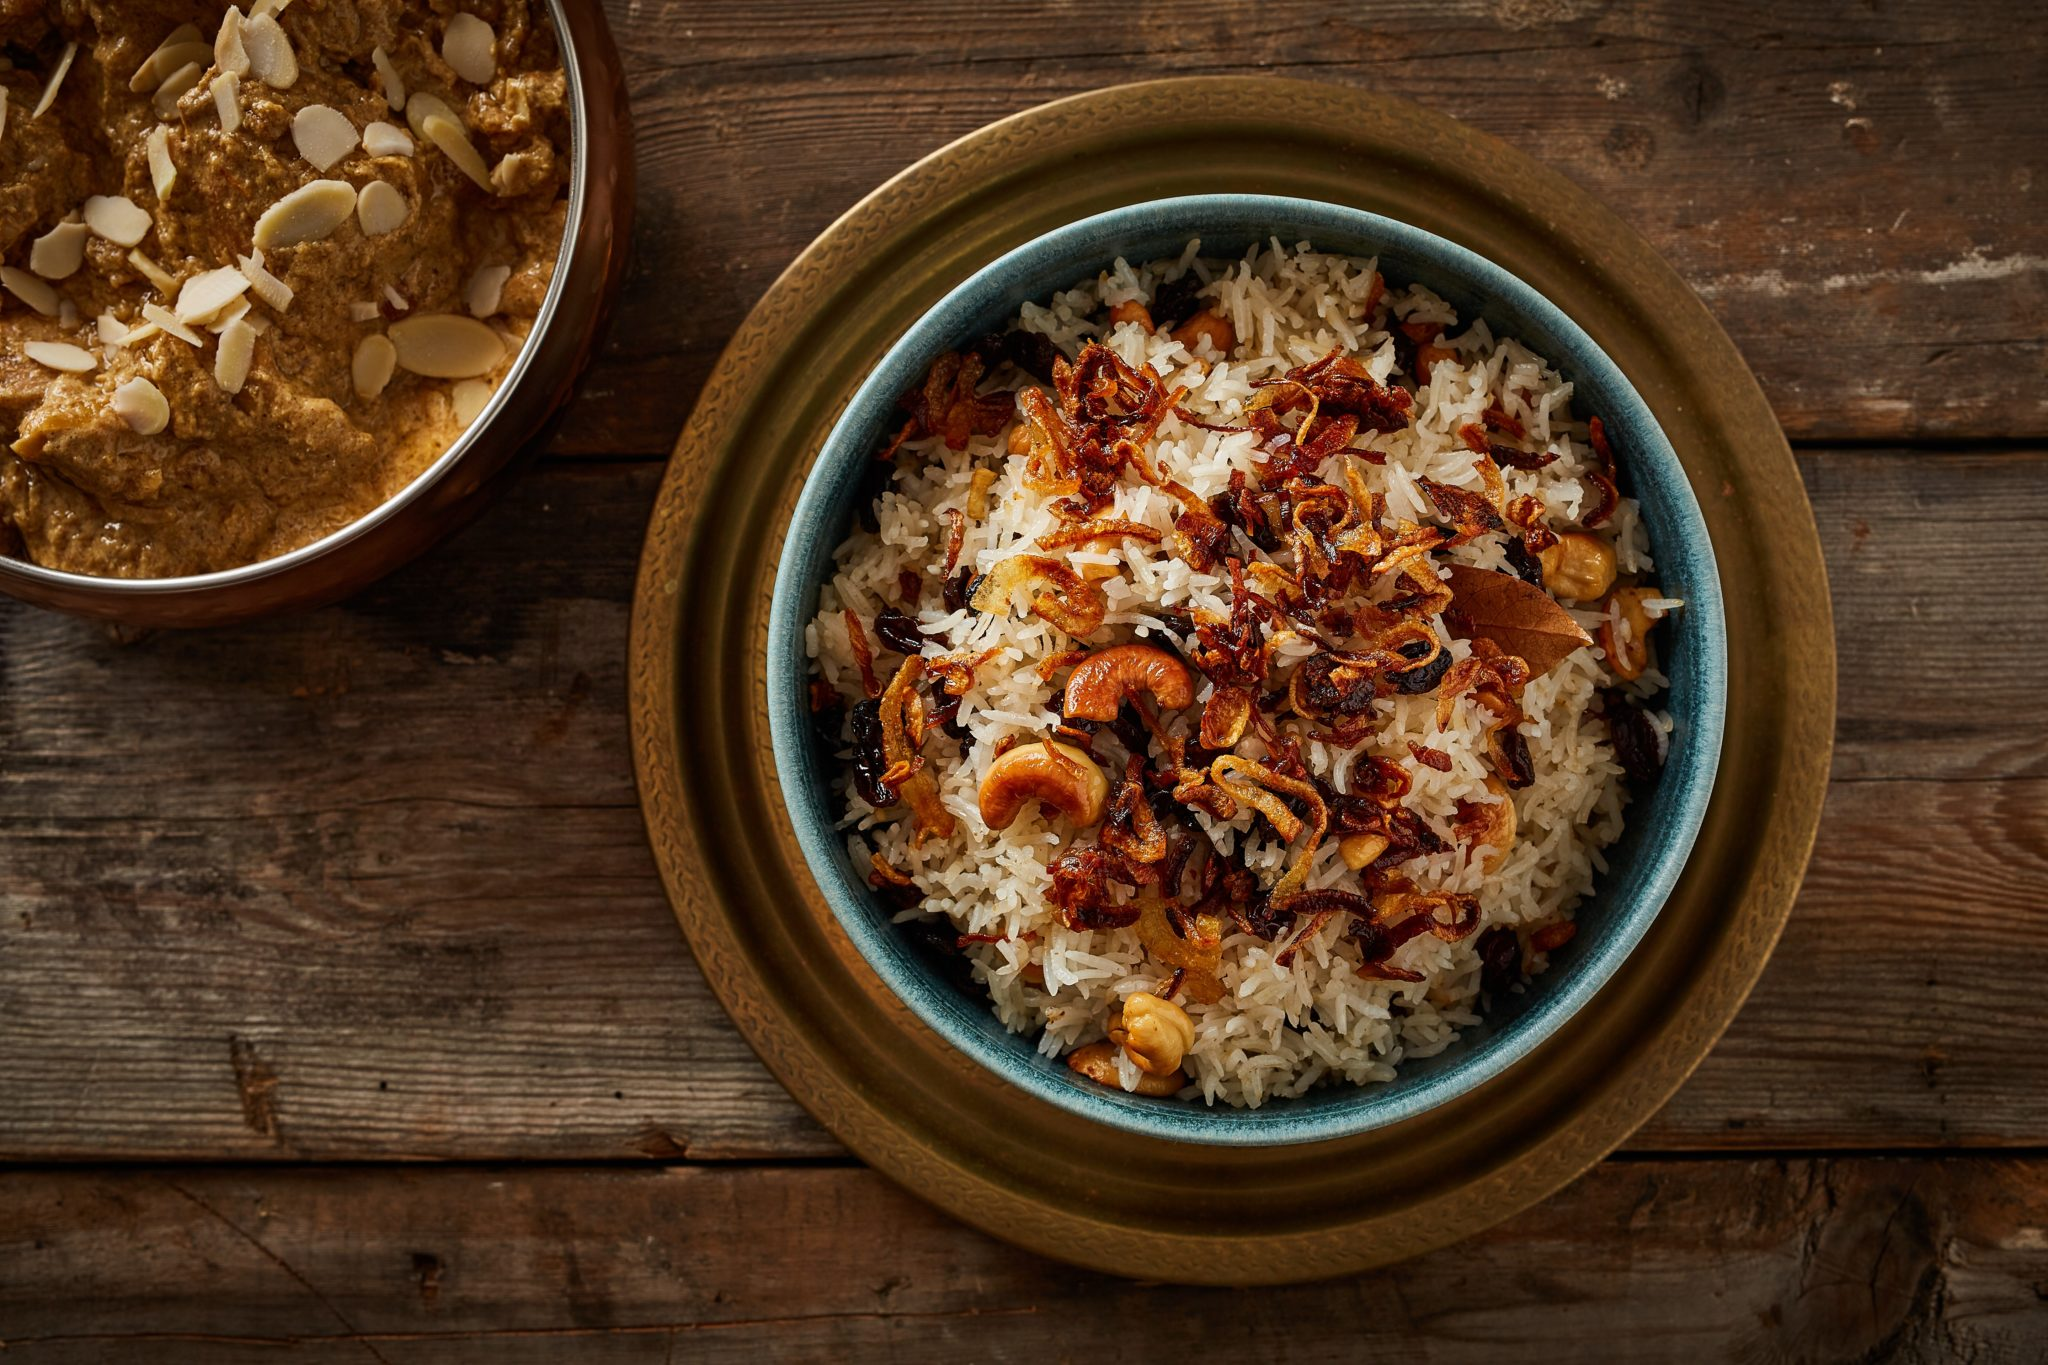 Sada pulao - Bengali pulao with cashews and raisins